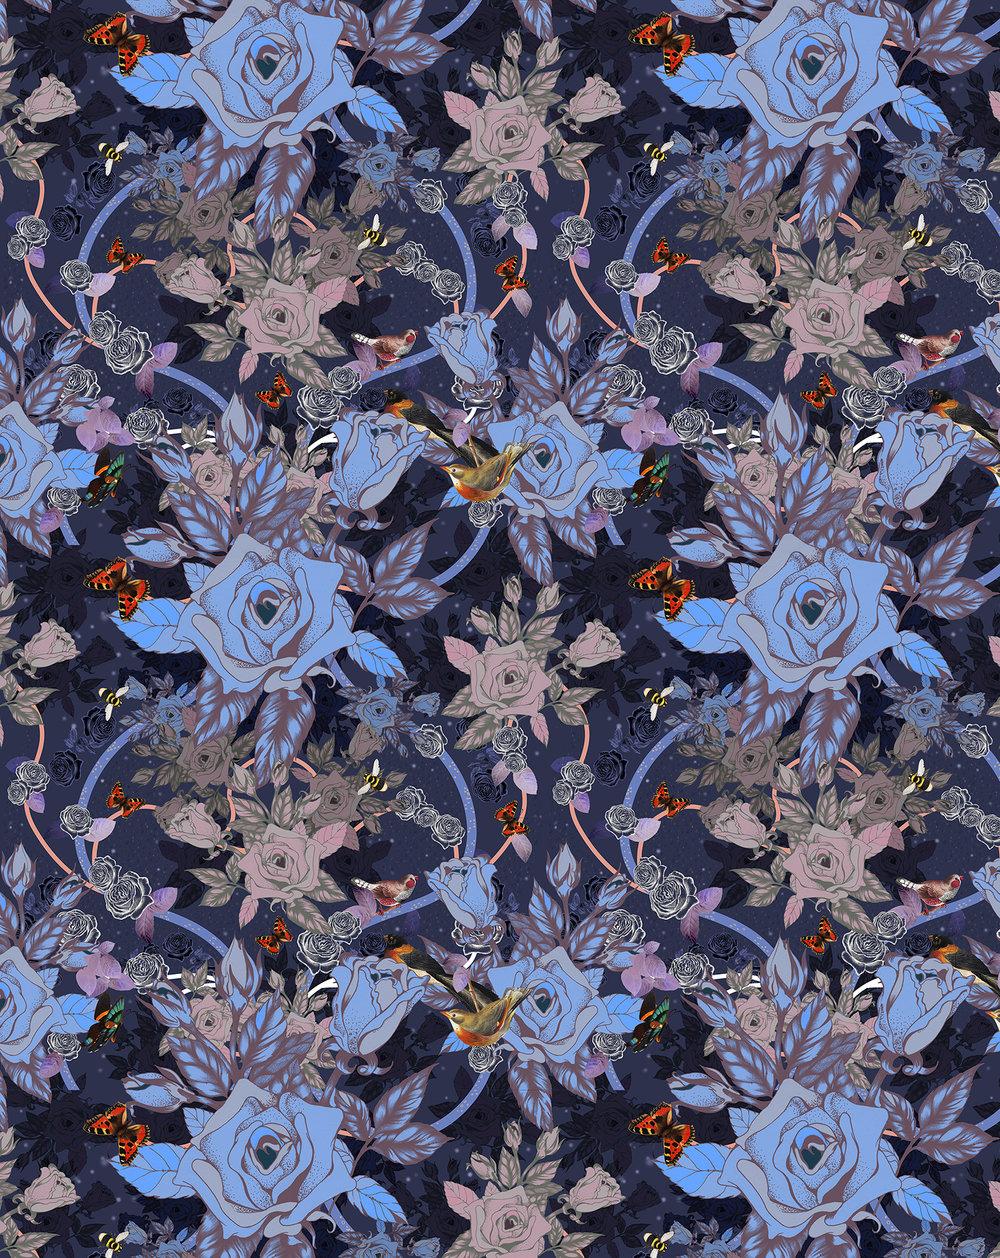 Pommechan_Pattern_Rose and Butterfly pattern1_Lowres_15x15.jpg